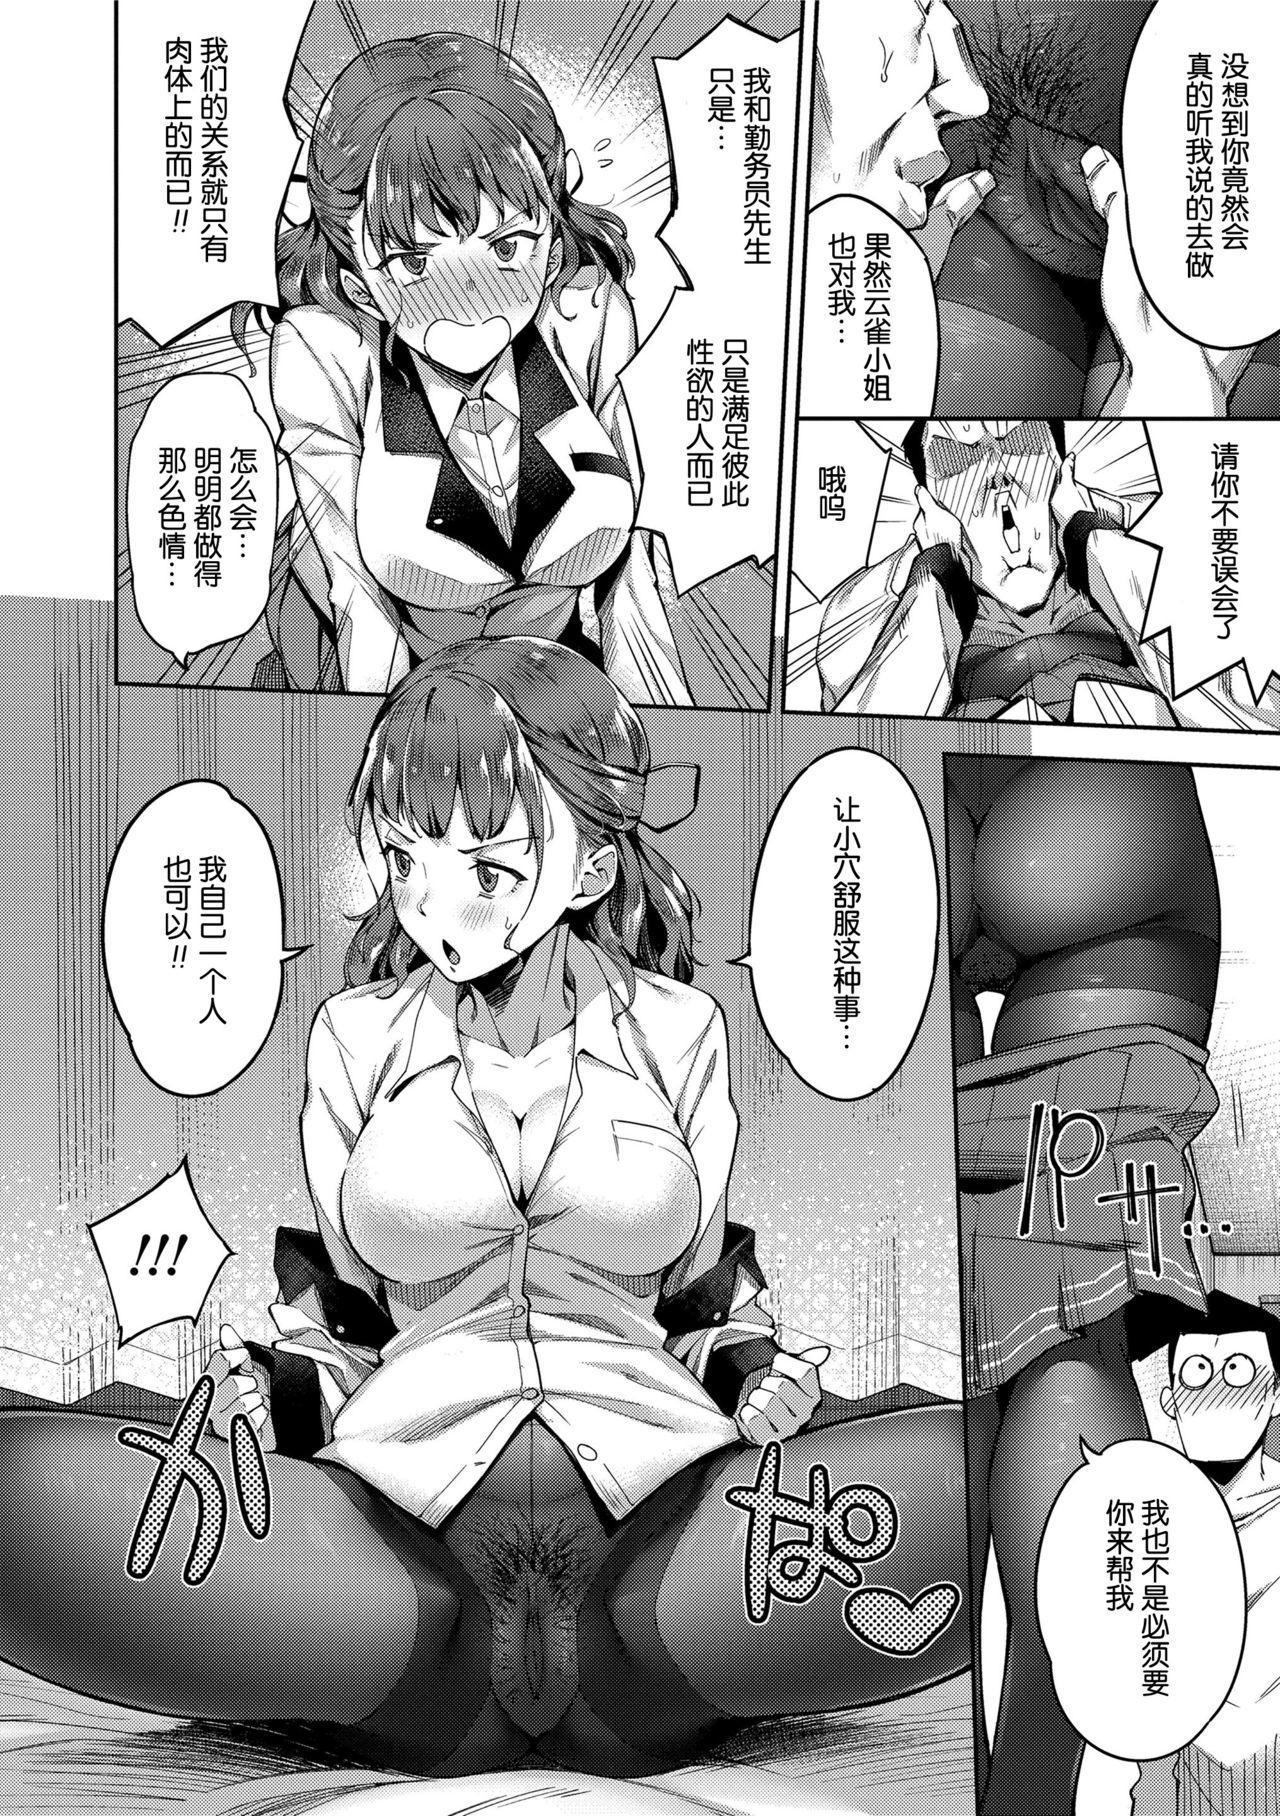 [sugarBt] Ai ga Nakutemo Ecchi wa Dekiru! - Even if There is No Love You Can H! Ch. 1-2 [Chinese] [Decensored] 23